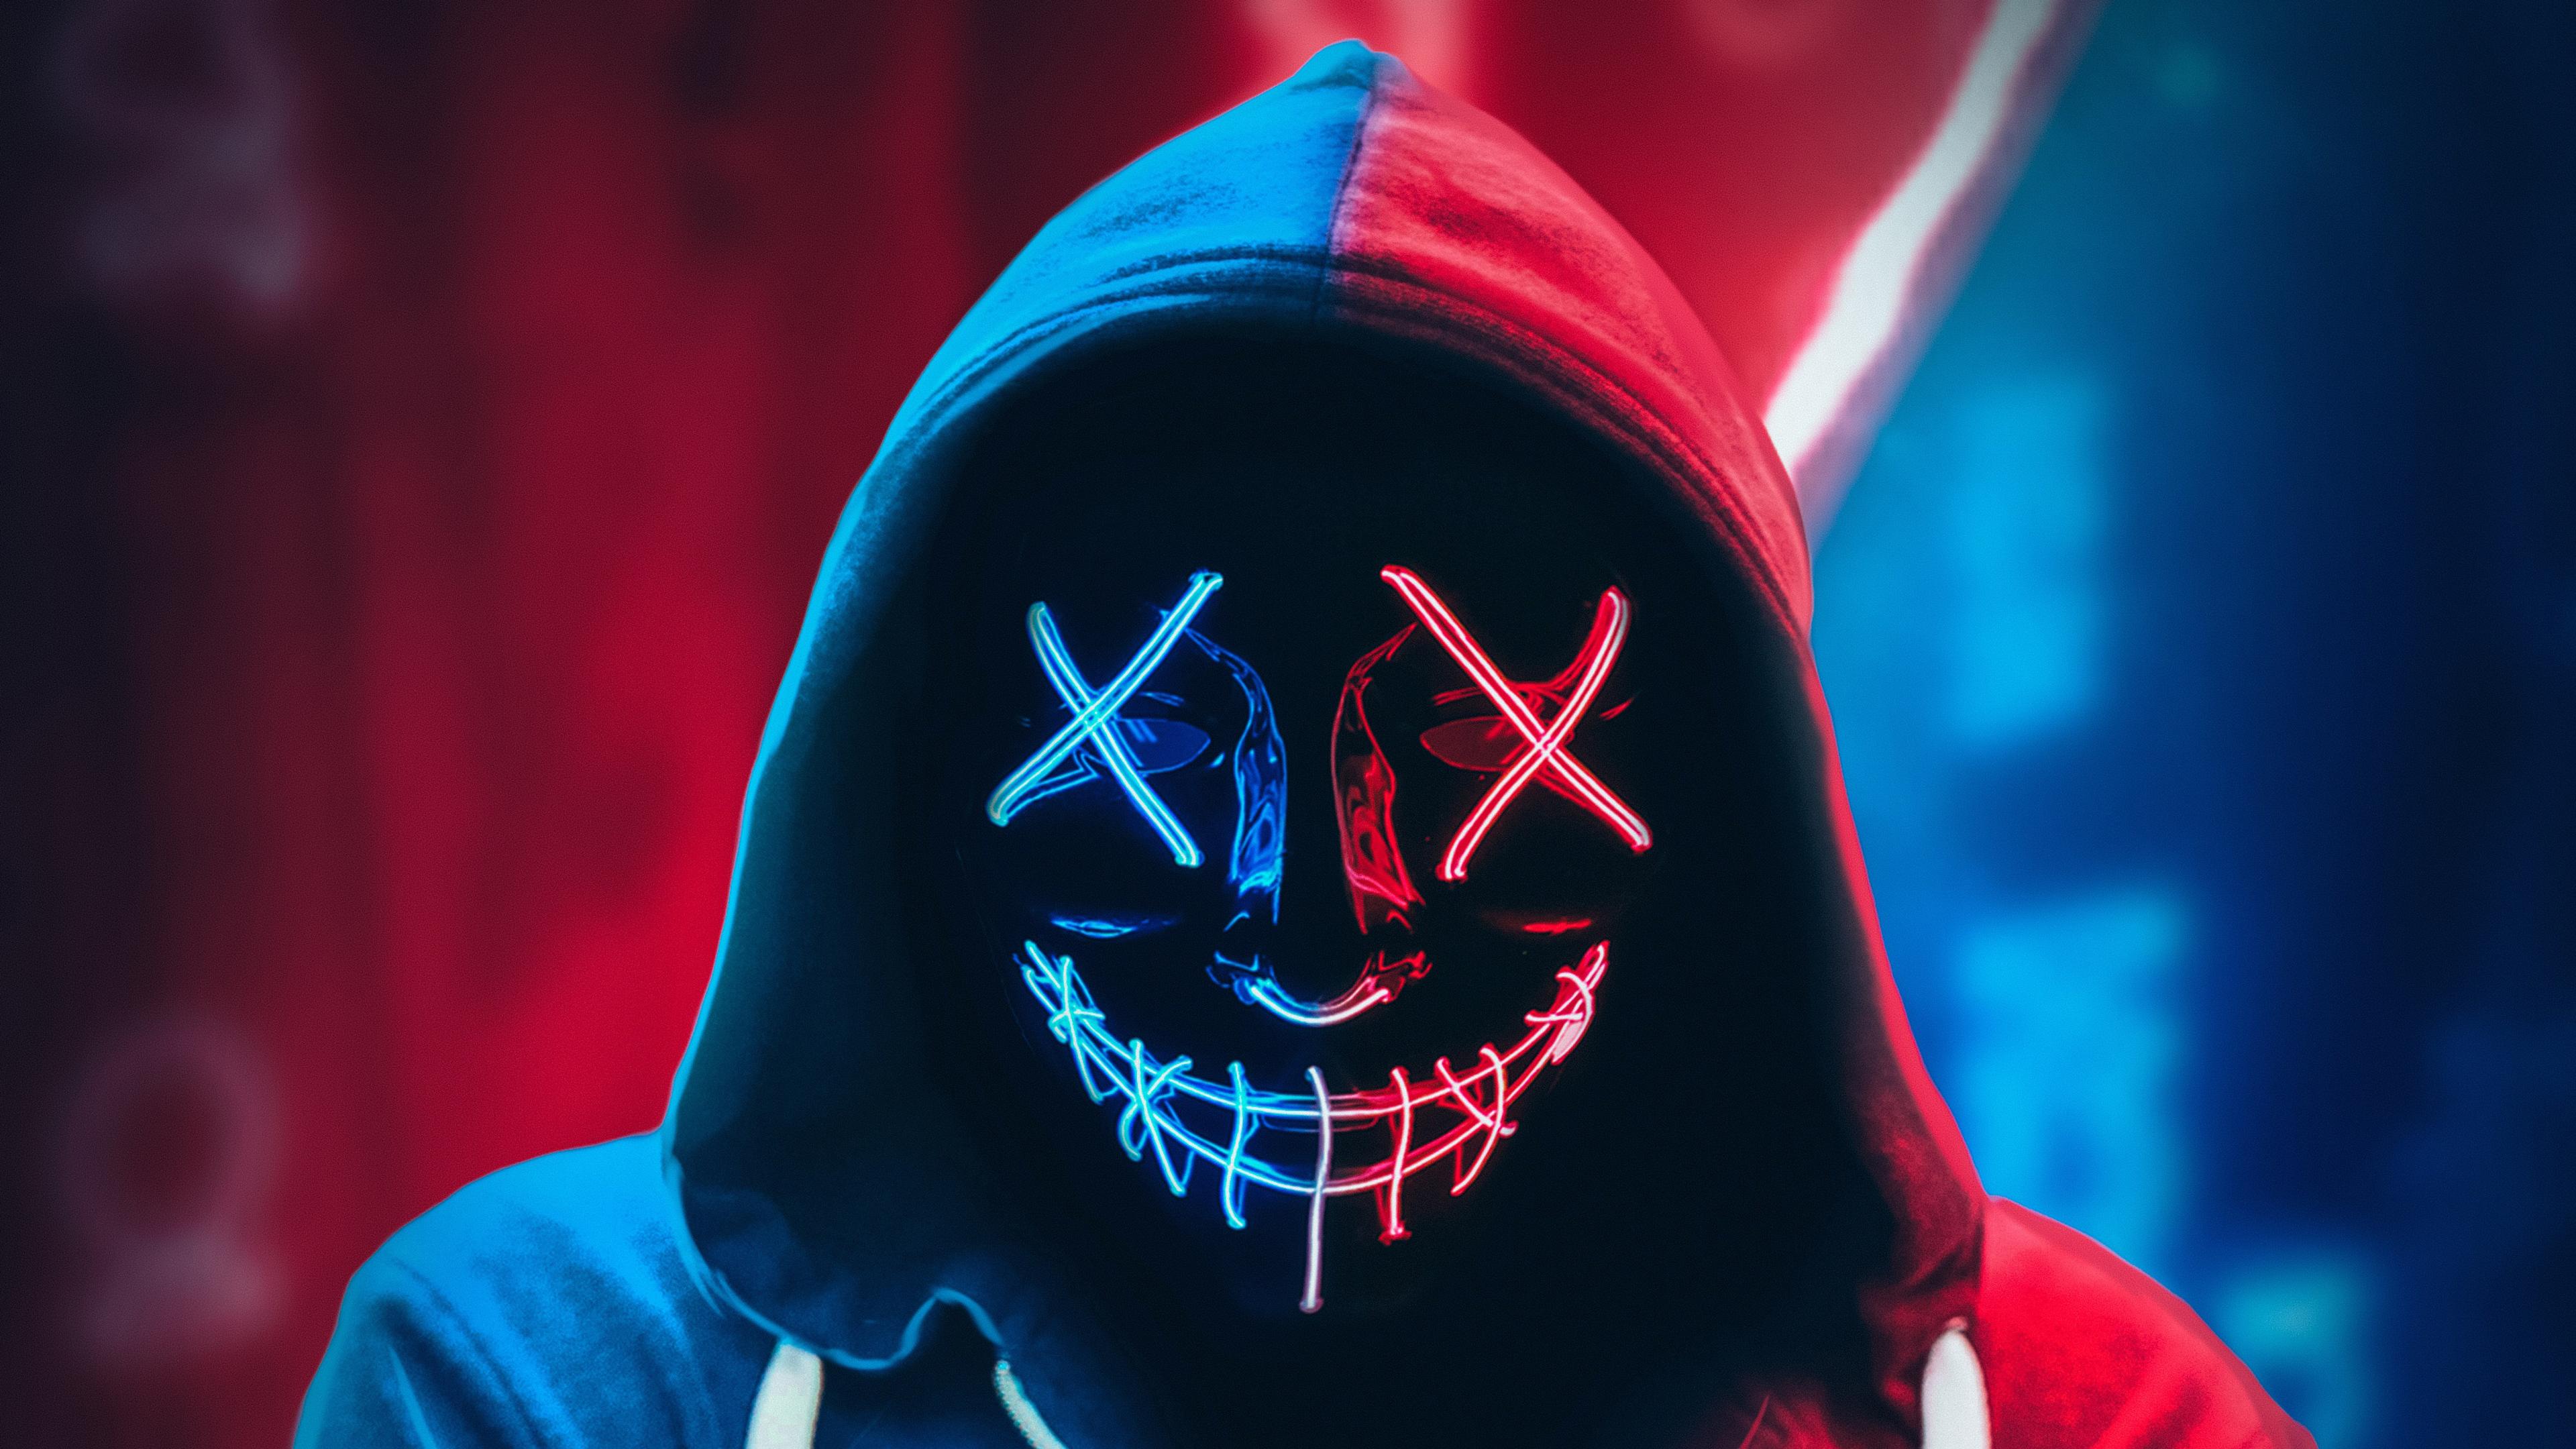 neon 4k mask wallpapers hoodie purge laptop desktop pc hypebeast guy masks money resolution heist led backgrounds amazing 1080p aesthetic